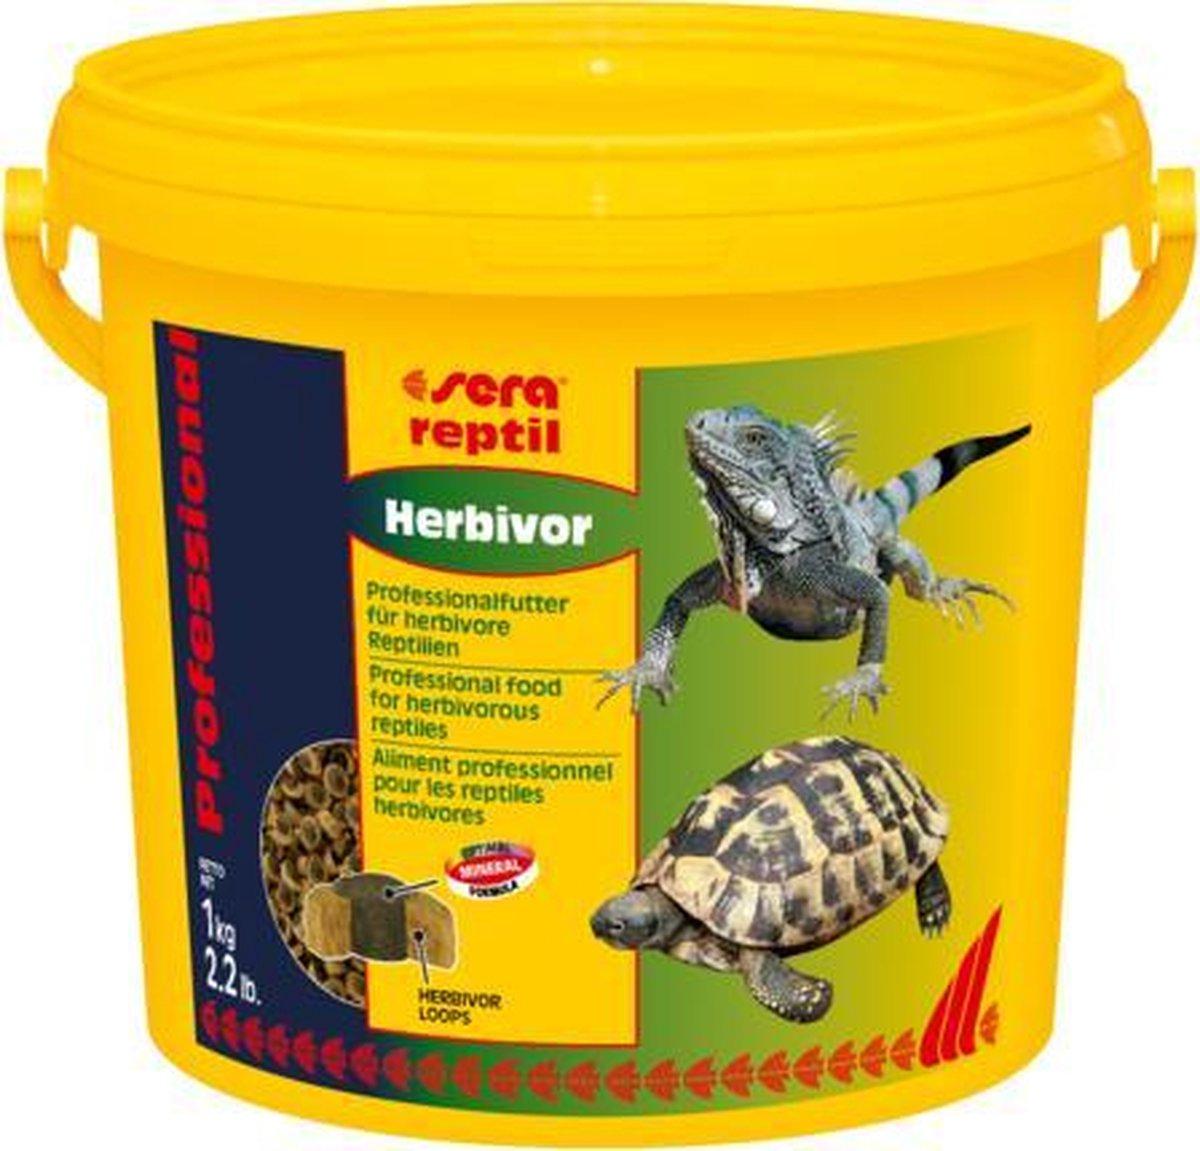 Sera Reptiel proffesional herbivor 3800ml schildpadvoer leguaan